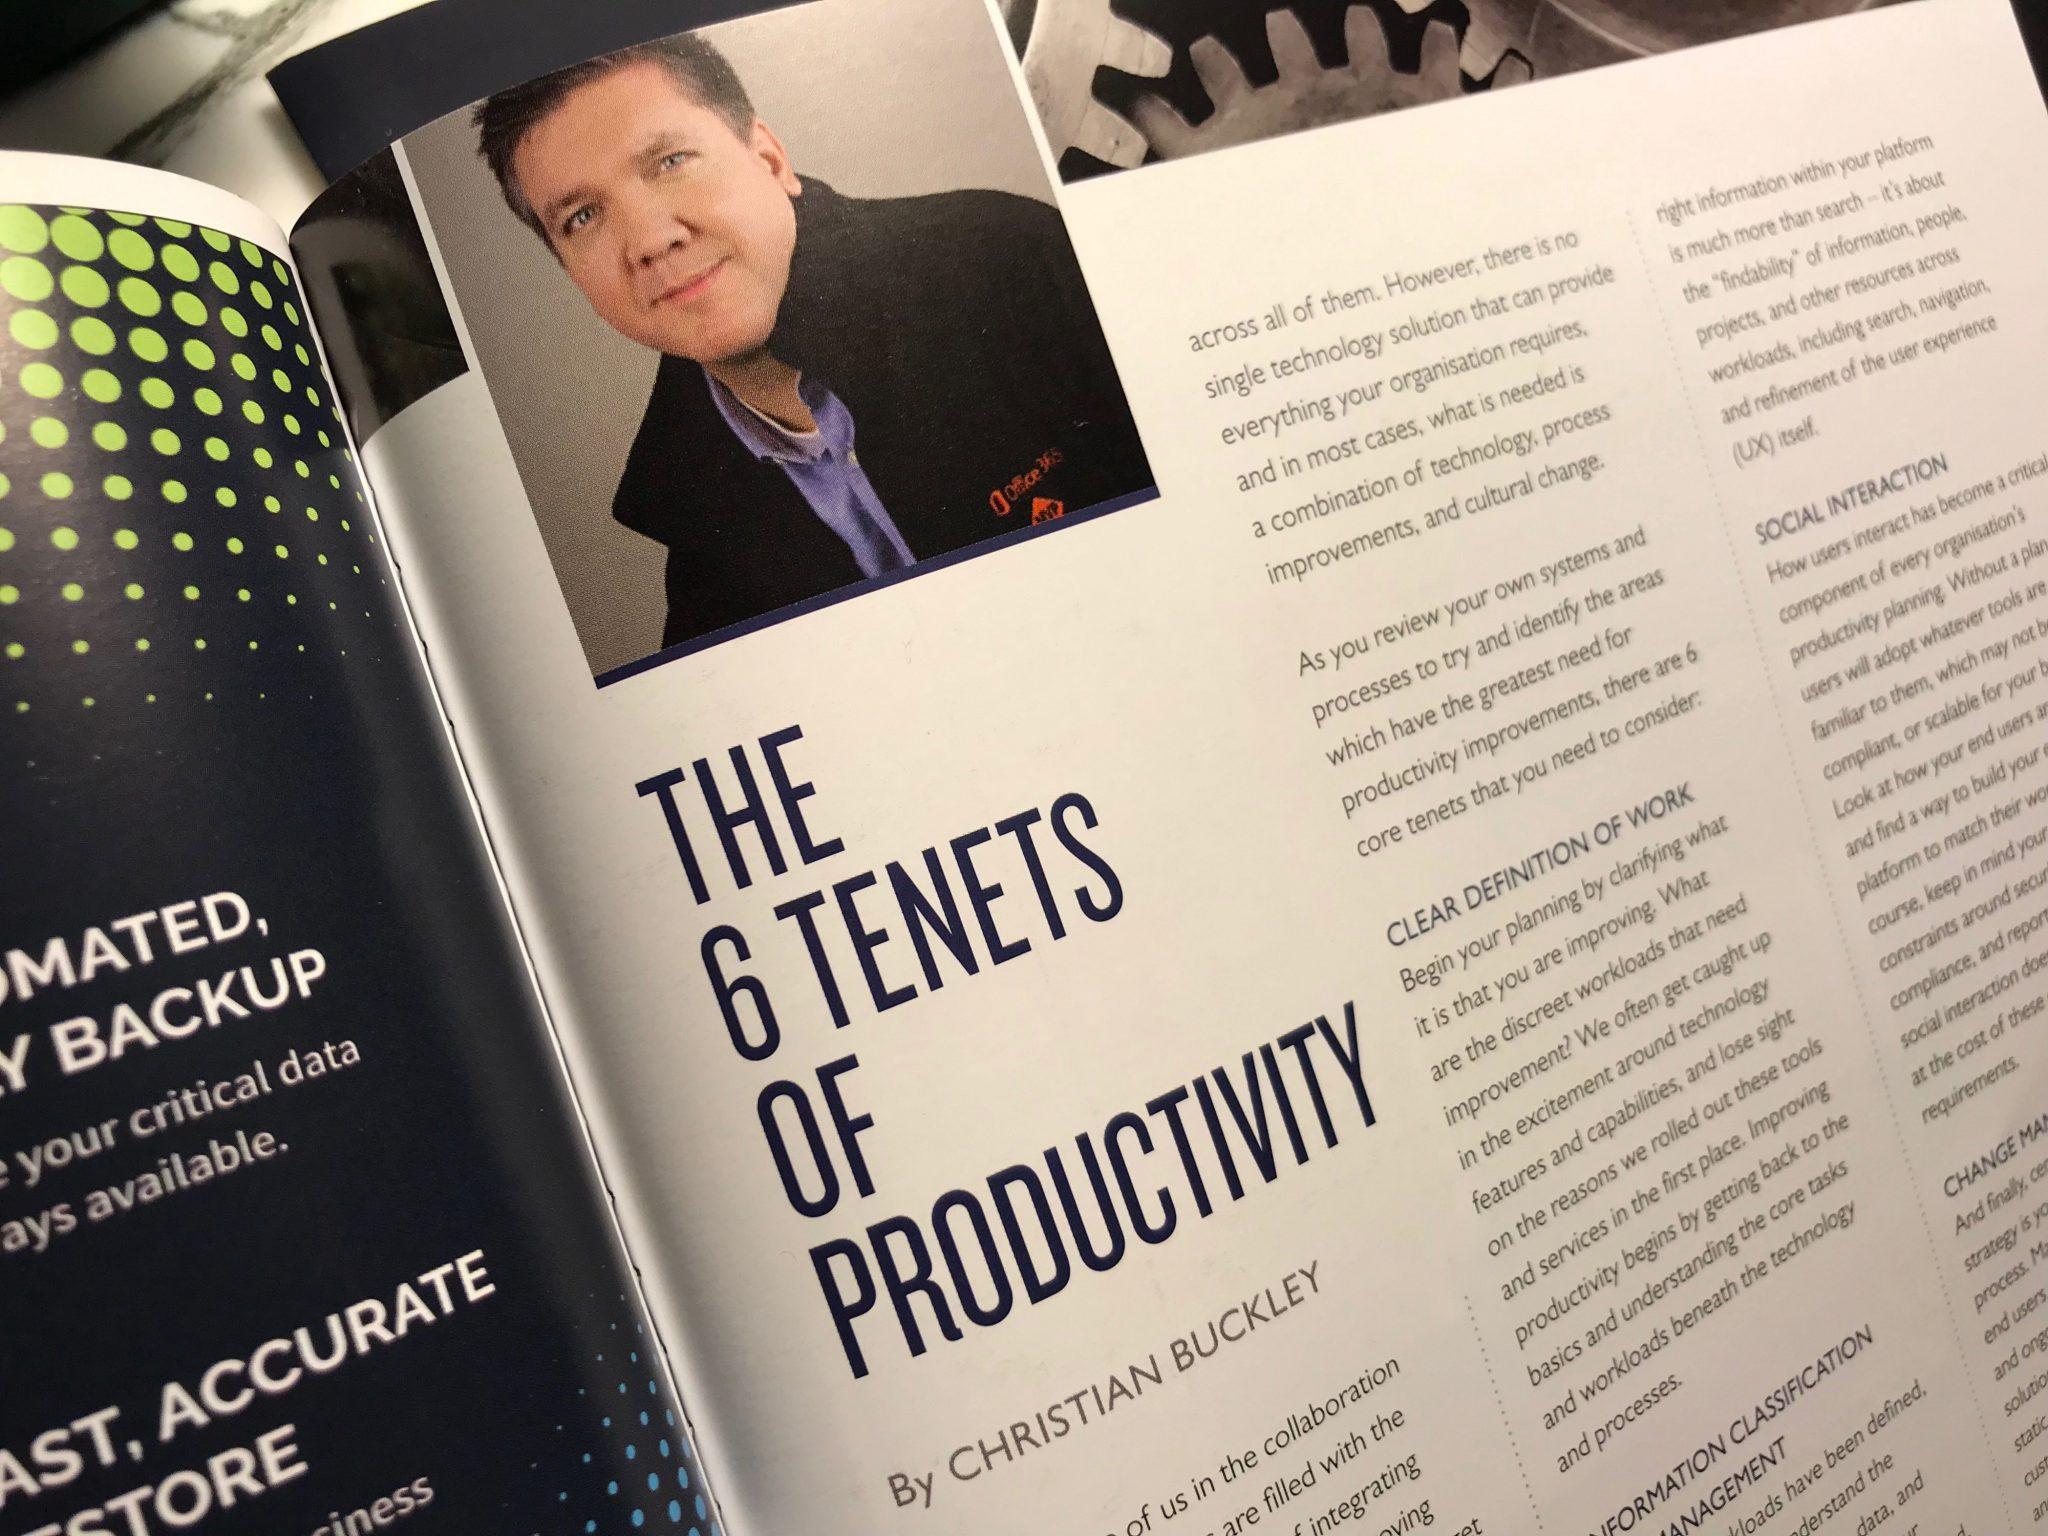 The 6 Tenets of Productivity